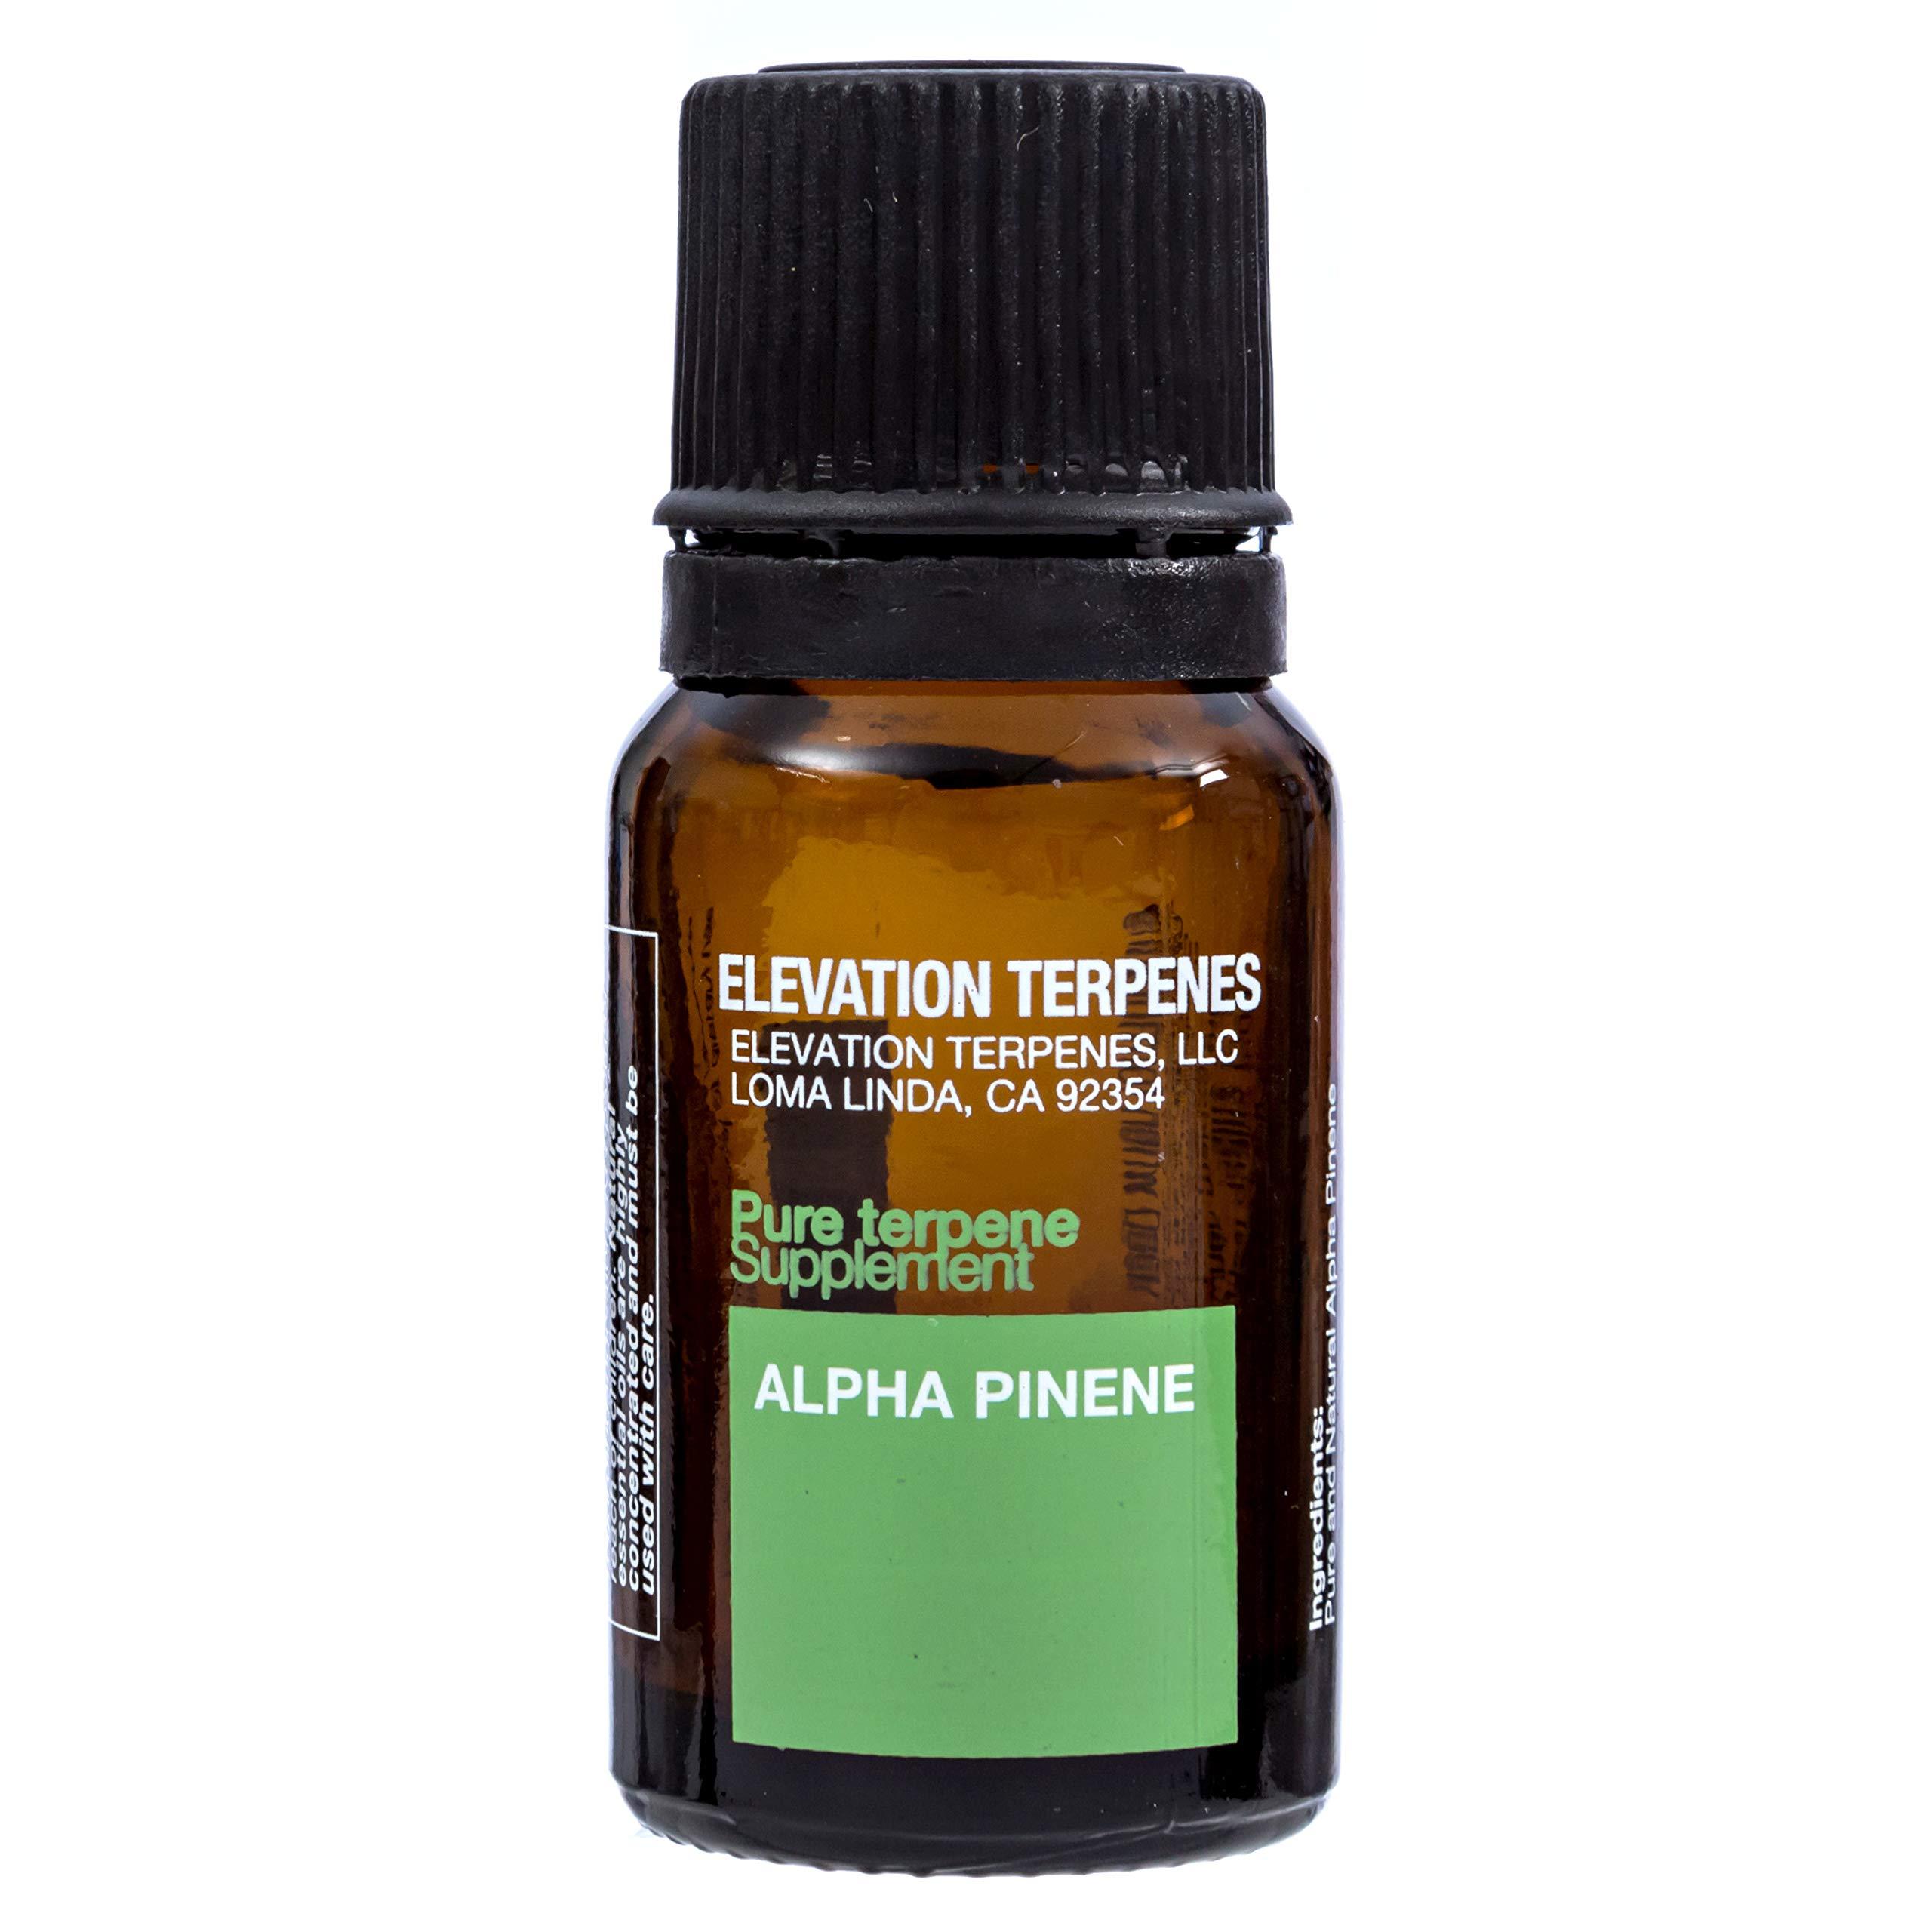 Elevation Terpenes 100% Alpha-Pinene Food Grade Terpene 10ML Produced in the USA by Elevation Terpenes